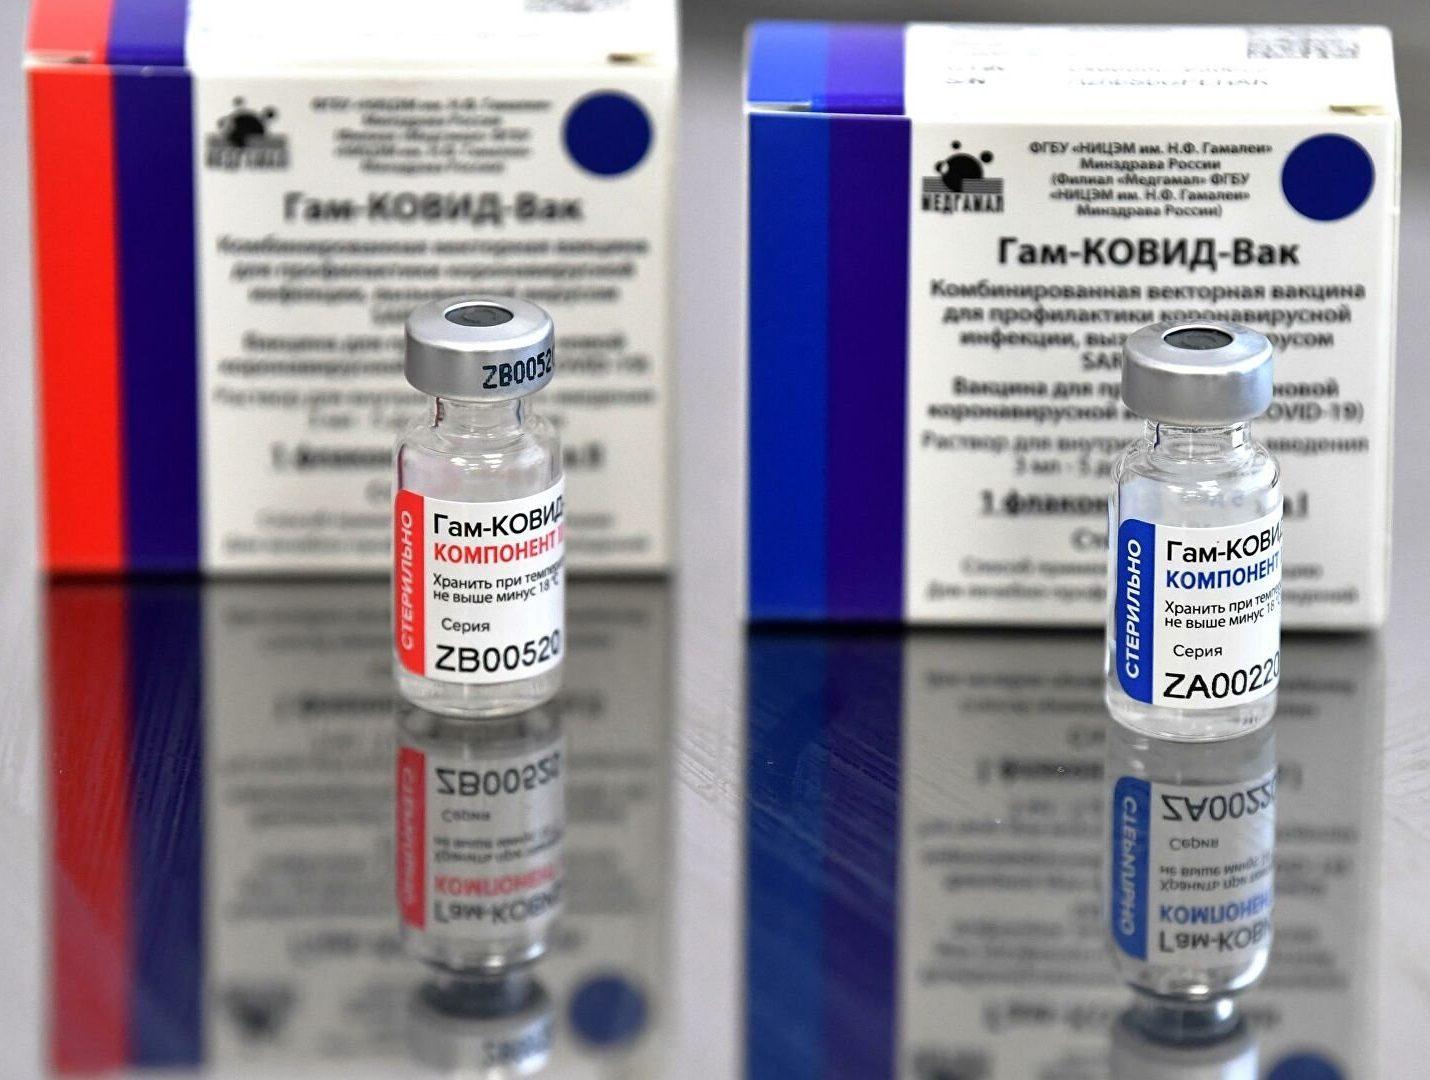 vacuna anti covid sputnik V coronavirus 0